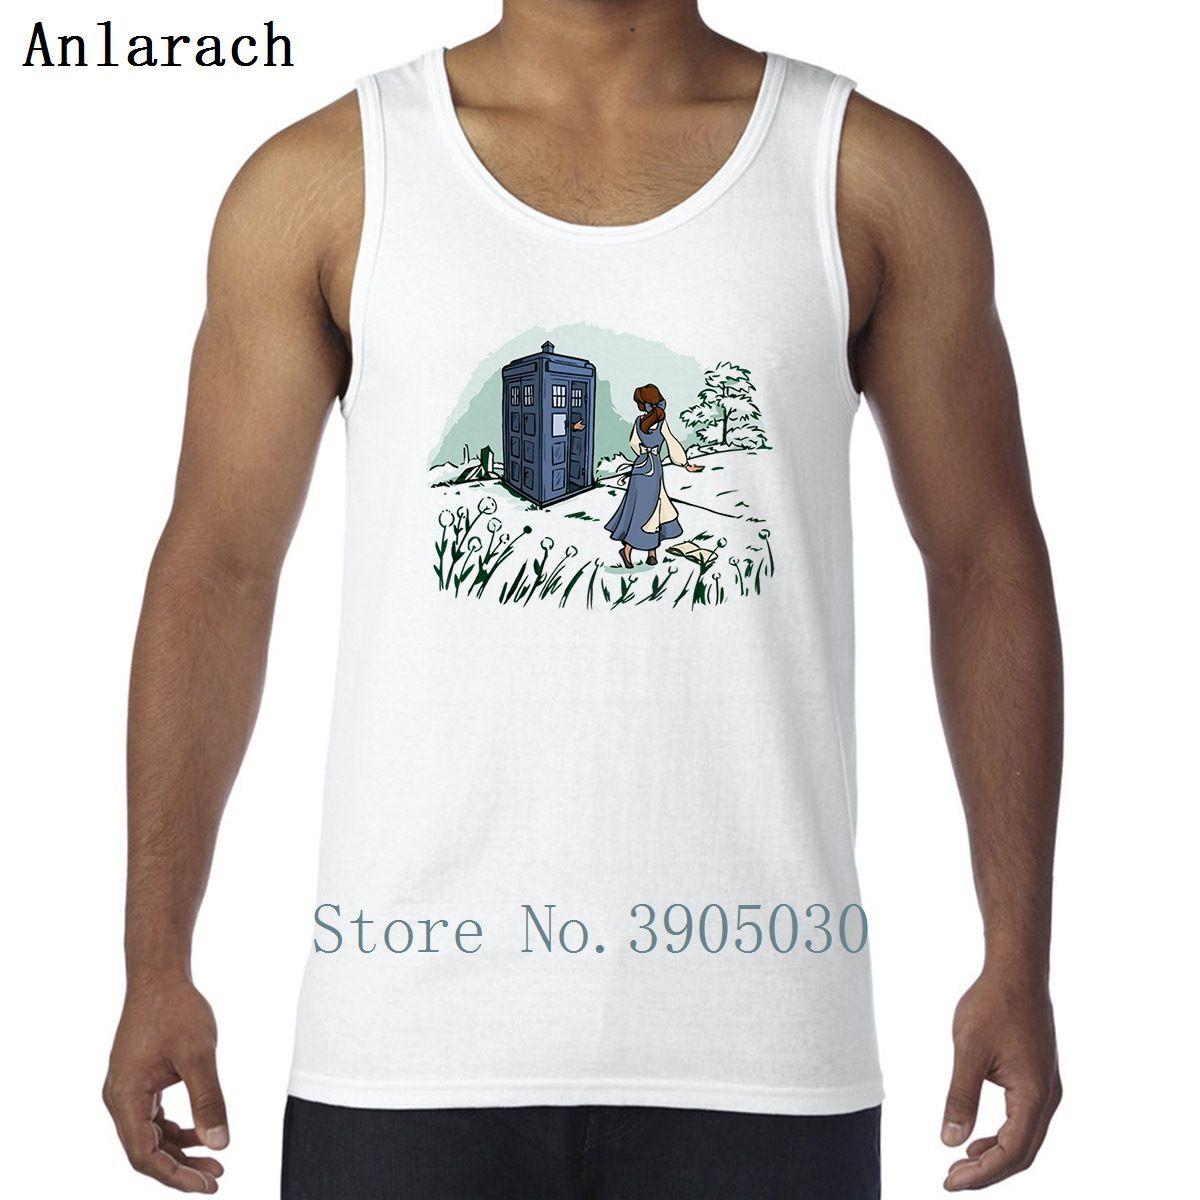 Beauty and Doctor Whot Vest Building Bio Color Solid Motto T-shirt senza maniche T-shirt da uomo